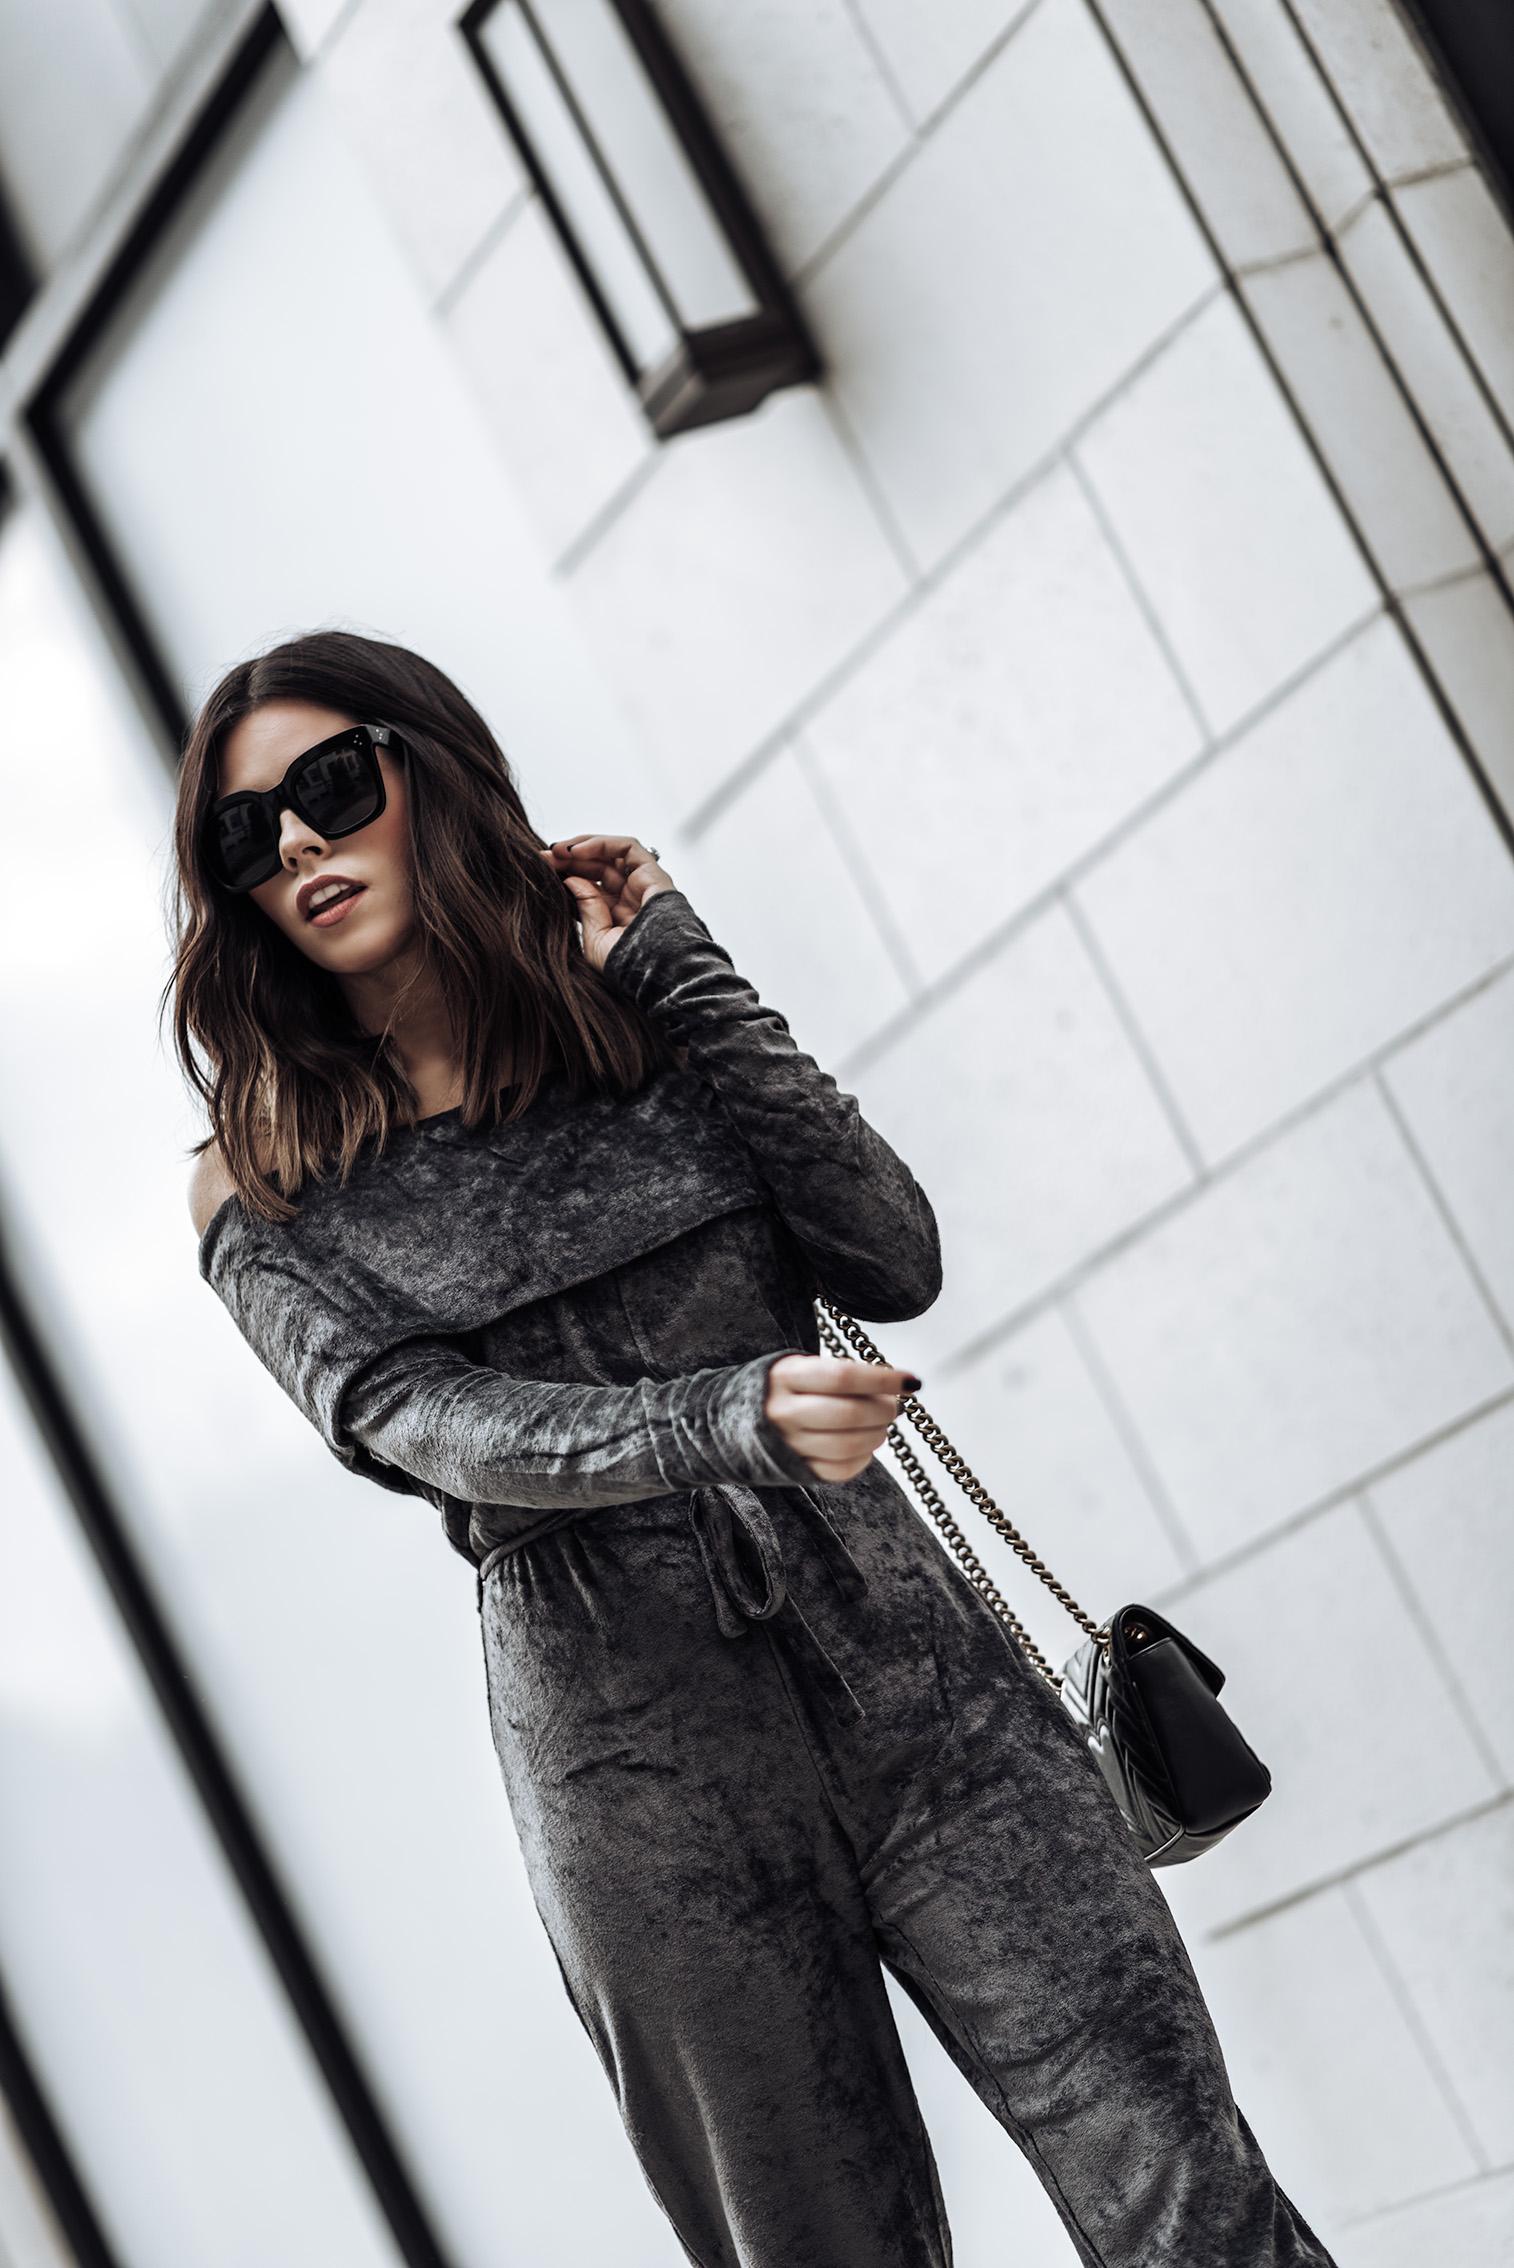 Velvet Jumpsuit | Gucci Bag | Tony Bianco Kashmir heels | Sunglasses #jumsuit #guccibag #holiday outfits